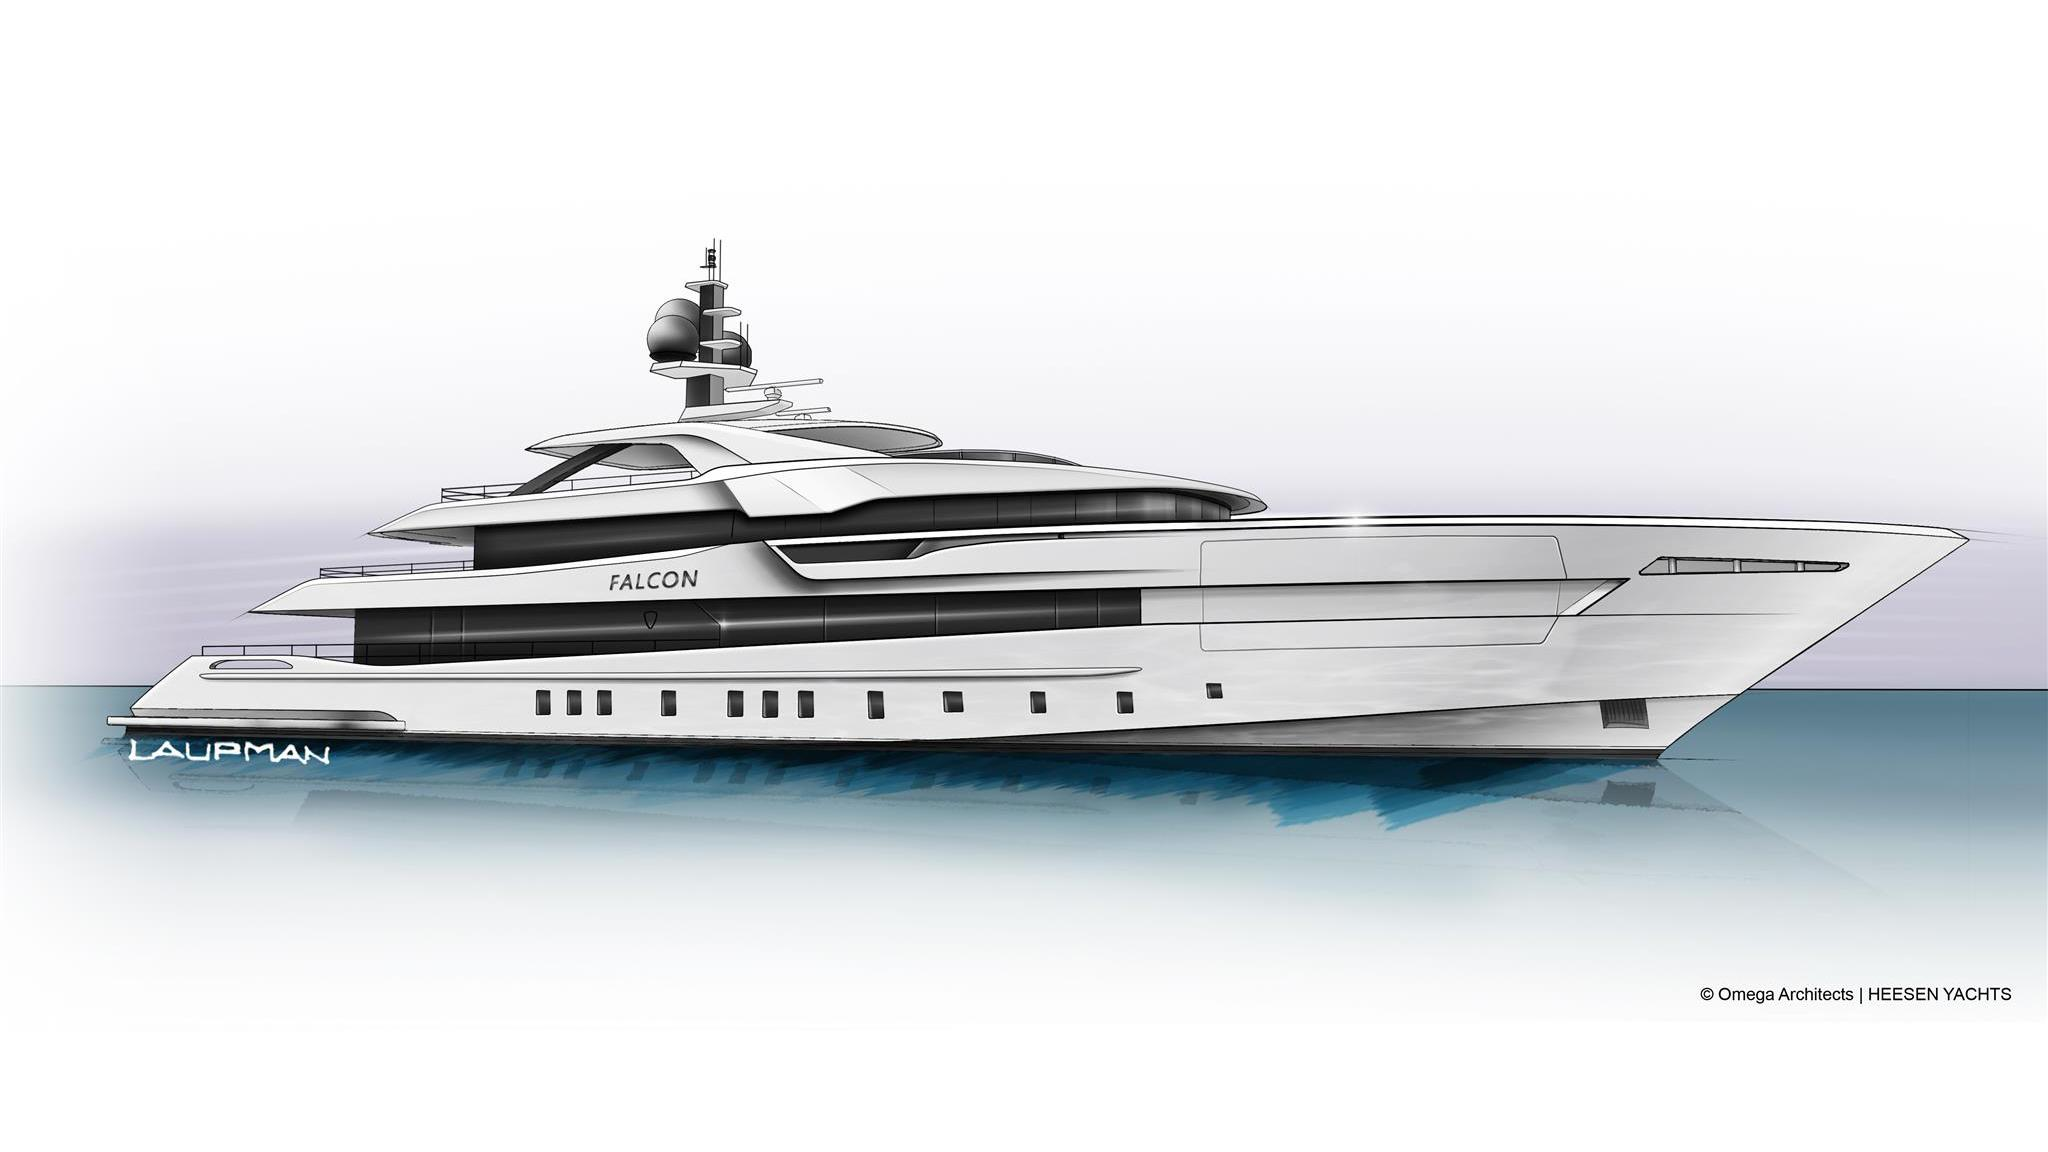 project falcon motoryacht heesen yachts 60m 2021 rendering